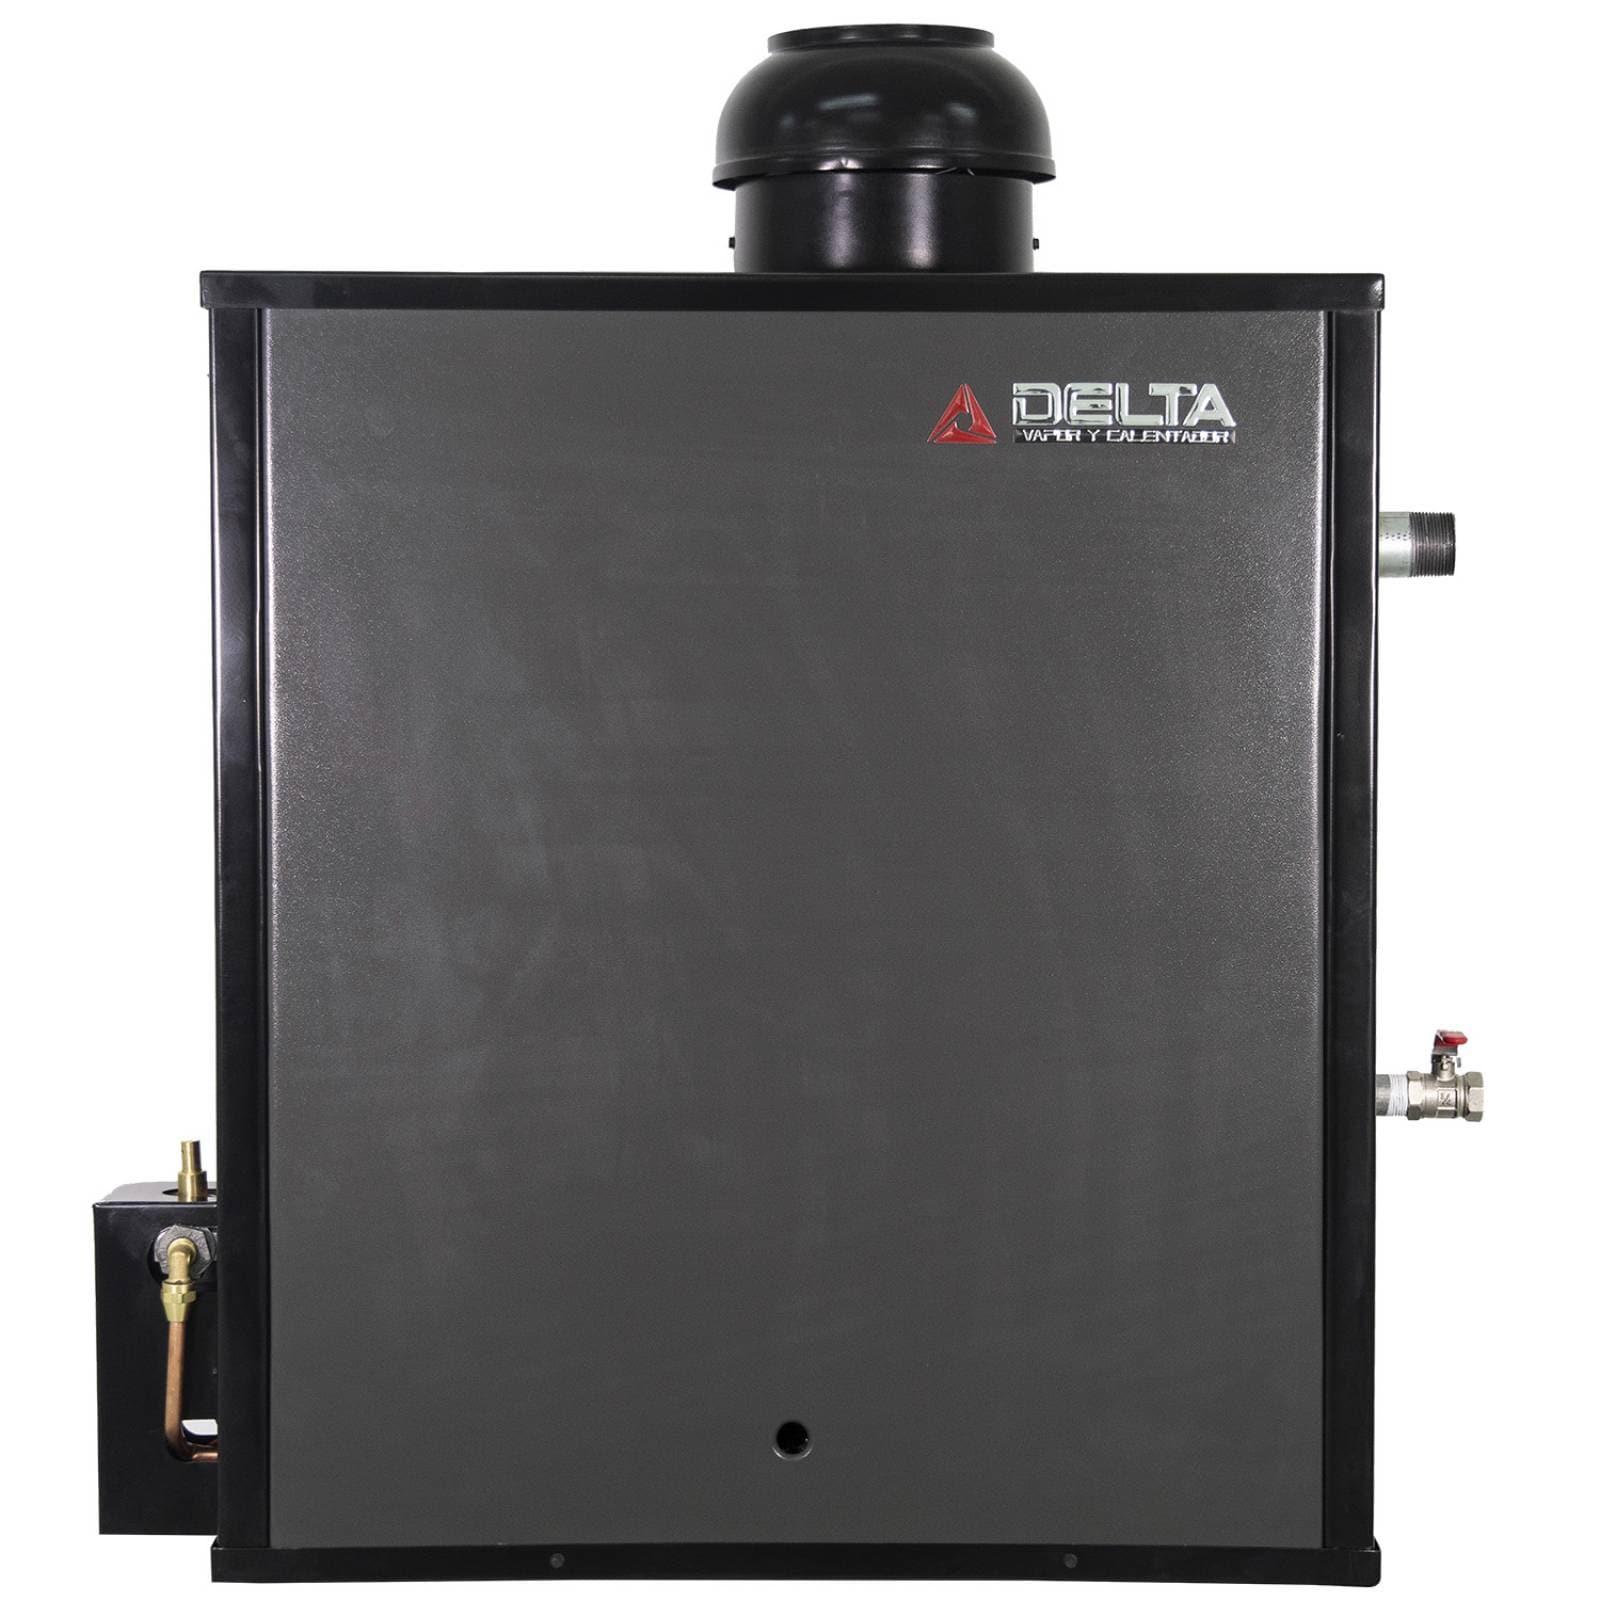 Generador de Vapor Diseñado para Hogar o Spa Instalación en Espacios de 15 m. Cúbicos Gas Natural Delta